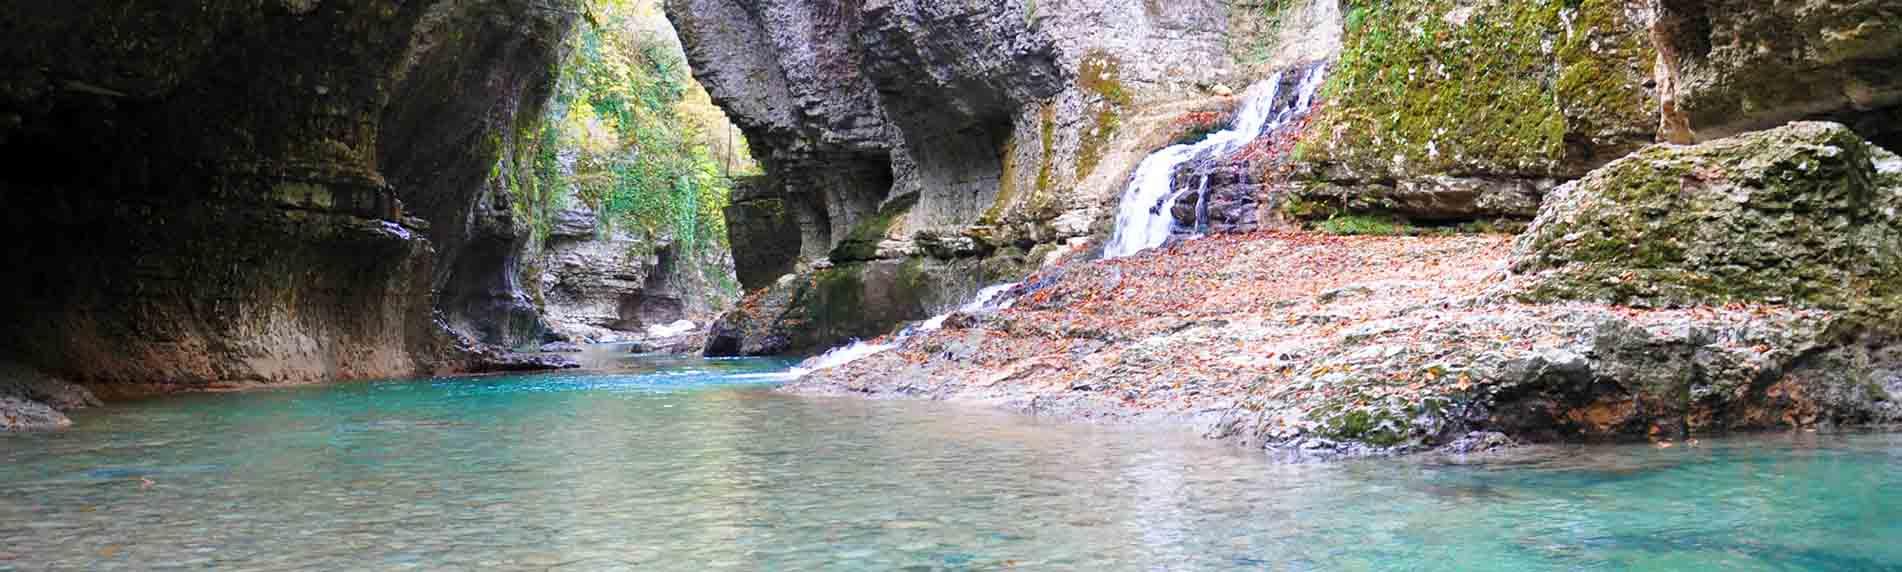 martvili canyon thrill